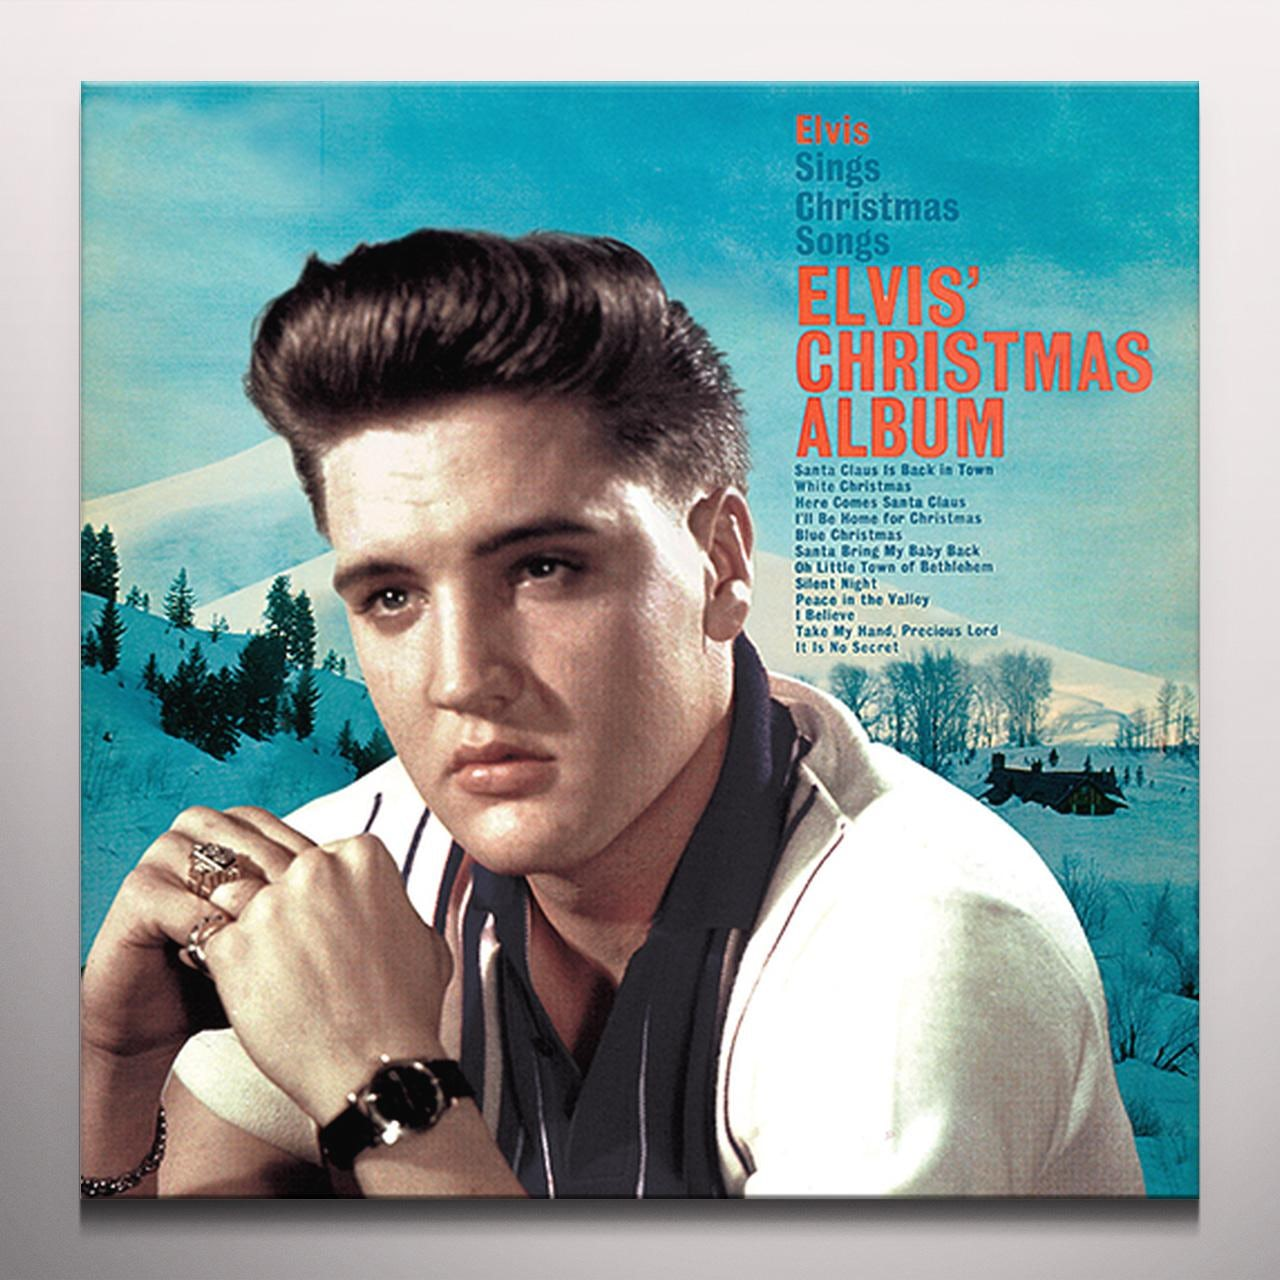 Elvis Christmas Album.Elvis Christmas Album Vinyl Record Limited Edition 180 Gram Pressing White Vinyl